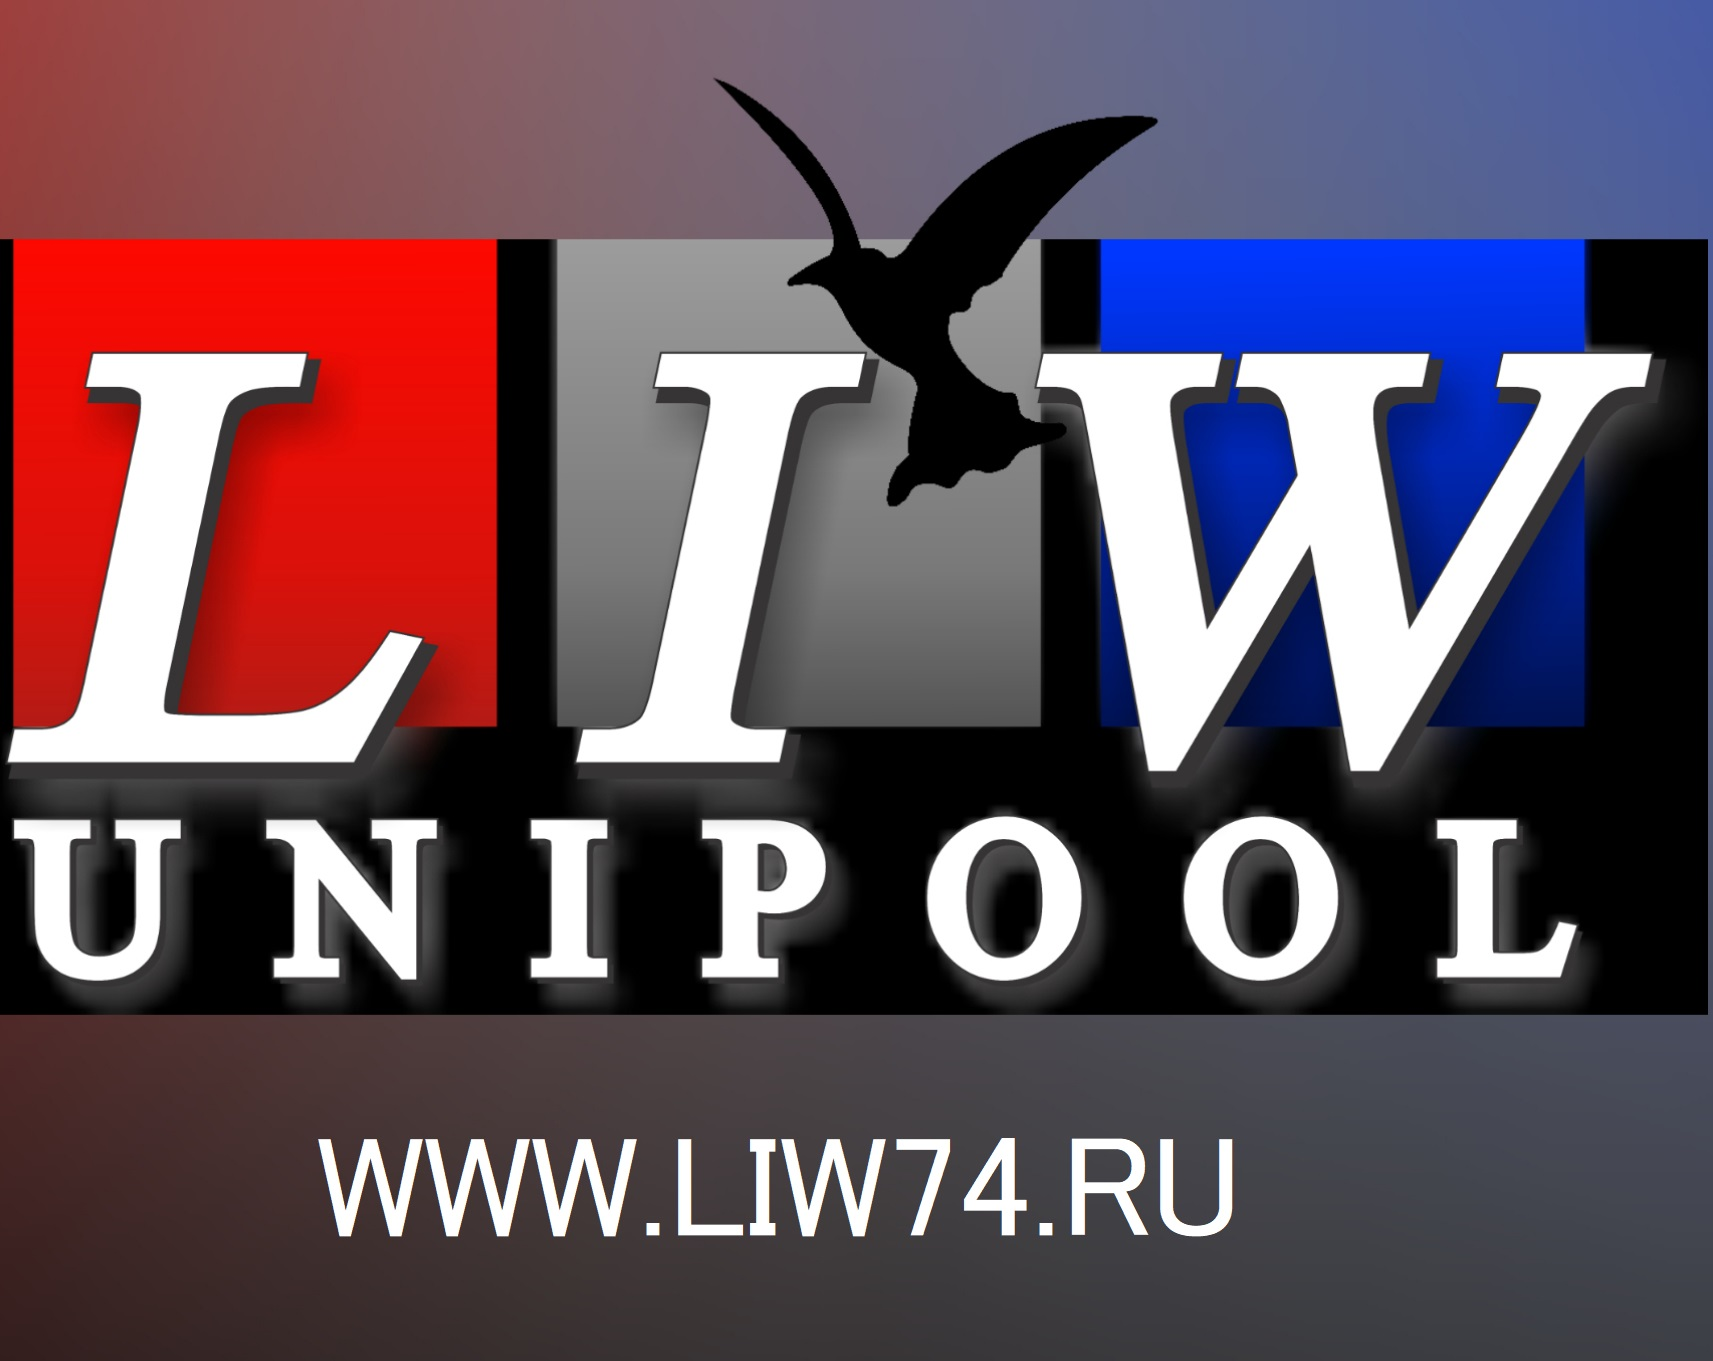 www.liw74.ru